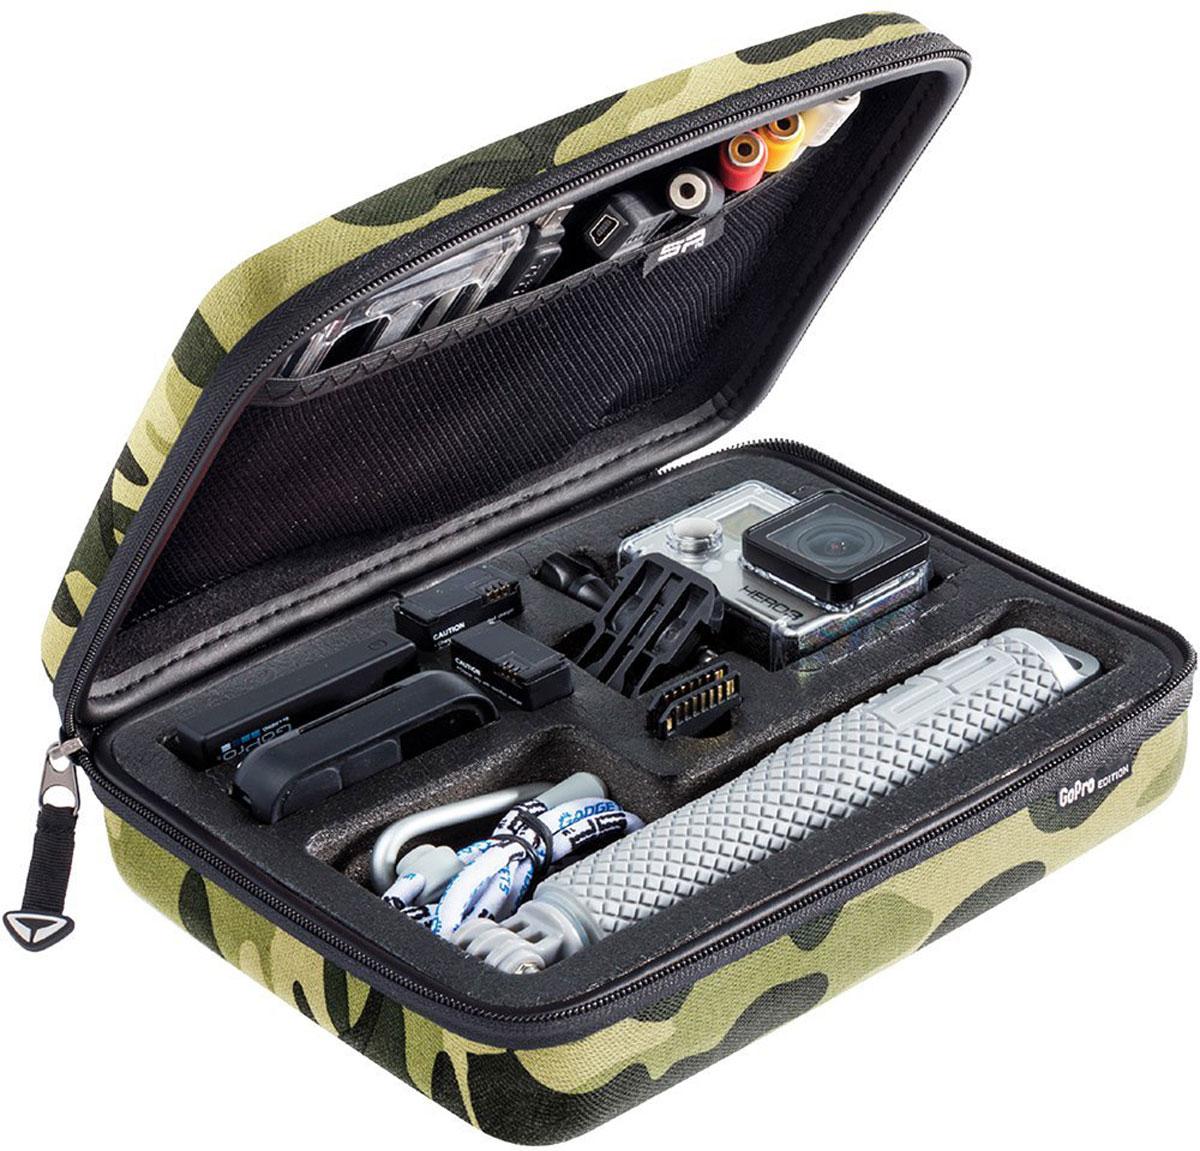 SP-Gadgets POV Case Small GoPro-Edition, Camel кейс для экшн-камеры